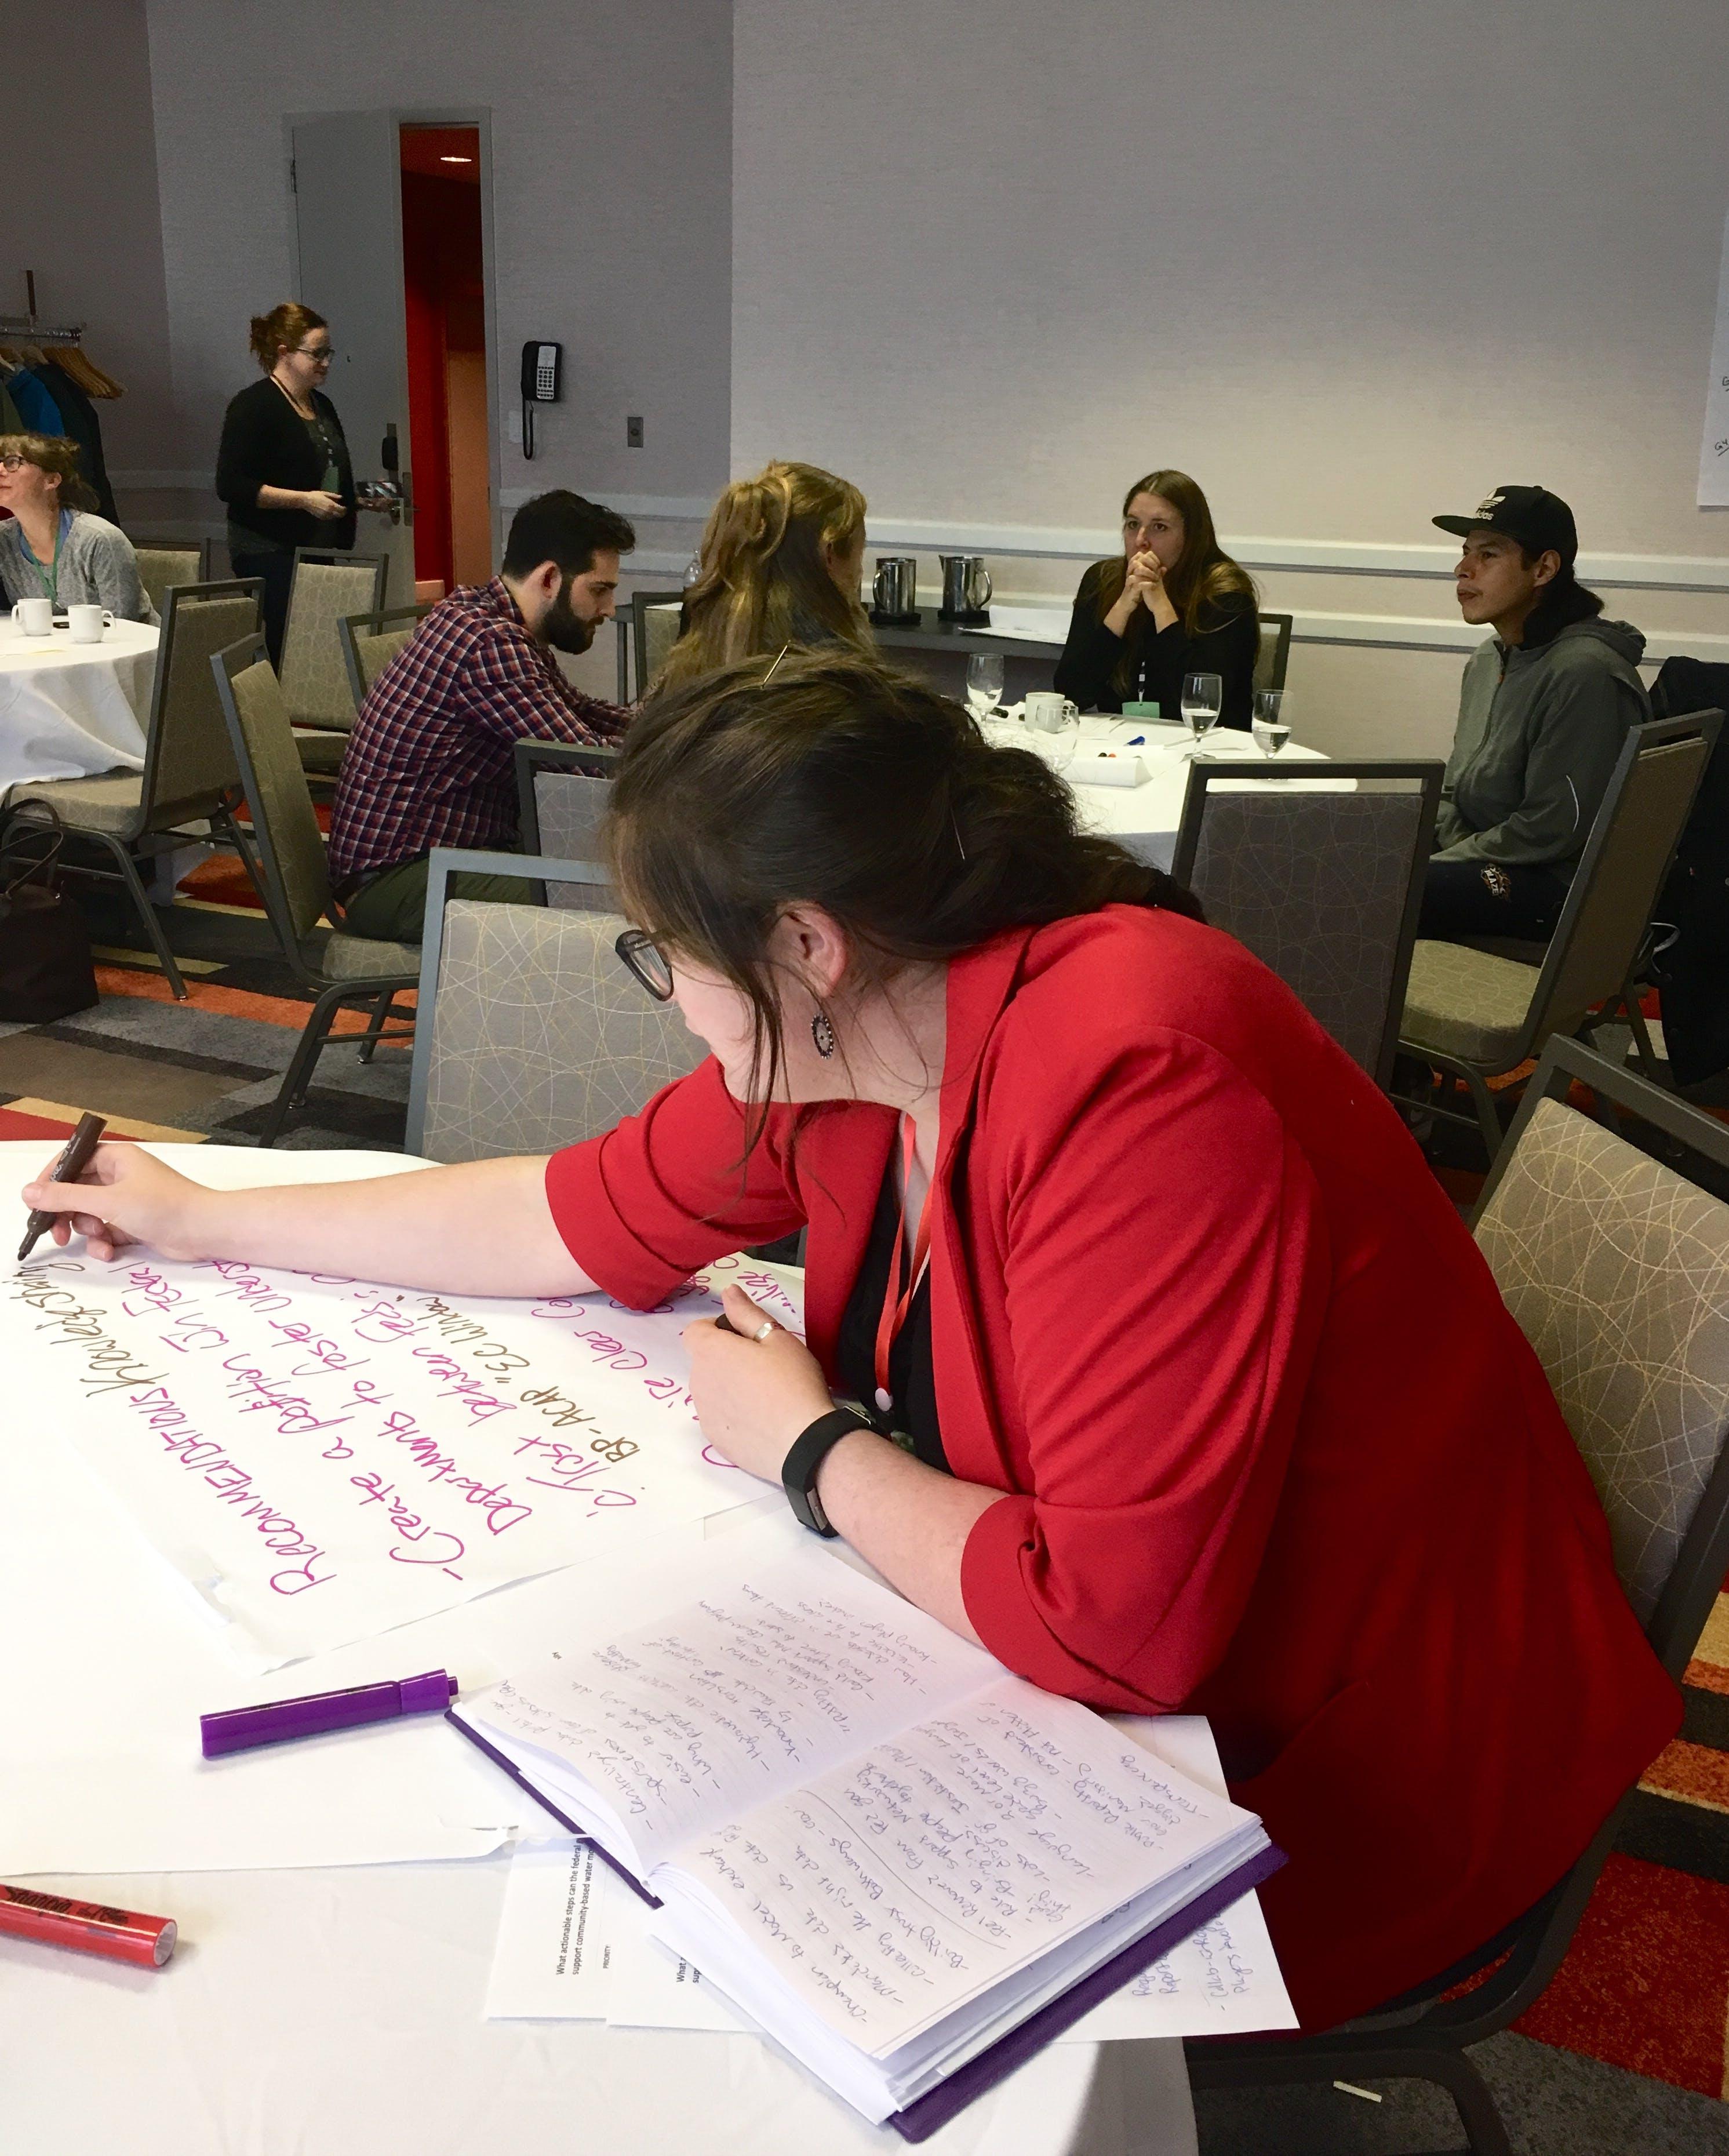 Emma hard at work transcribing recommendations